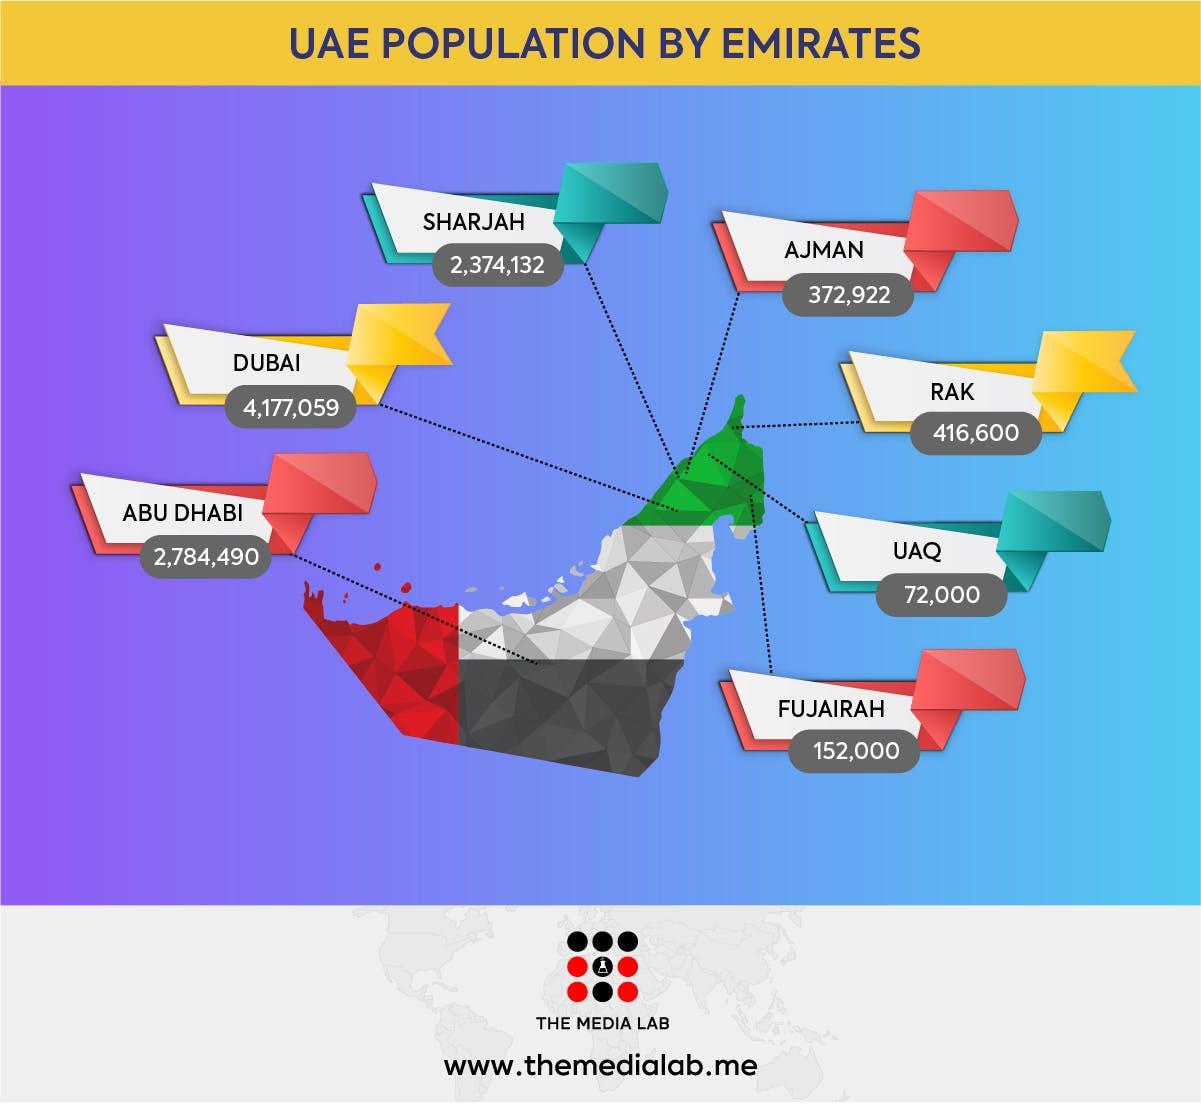 Emirates wise population in UAE 2019